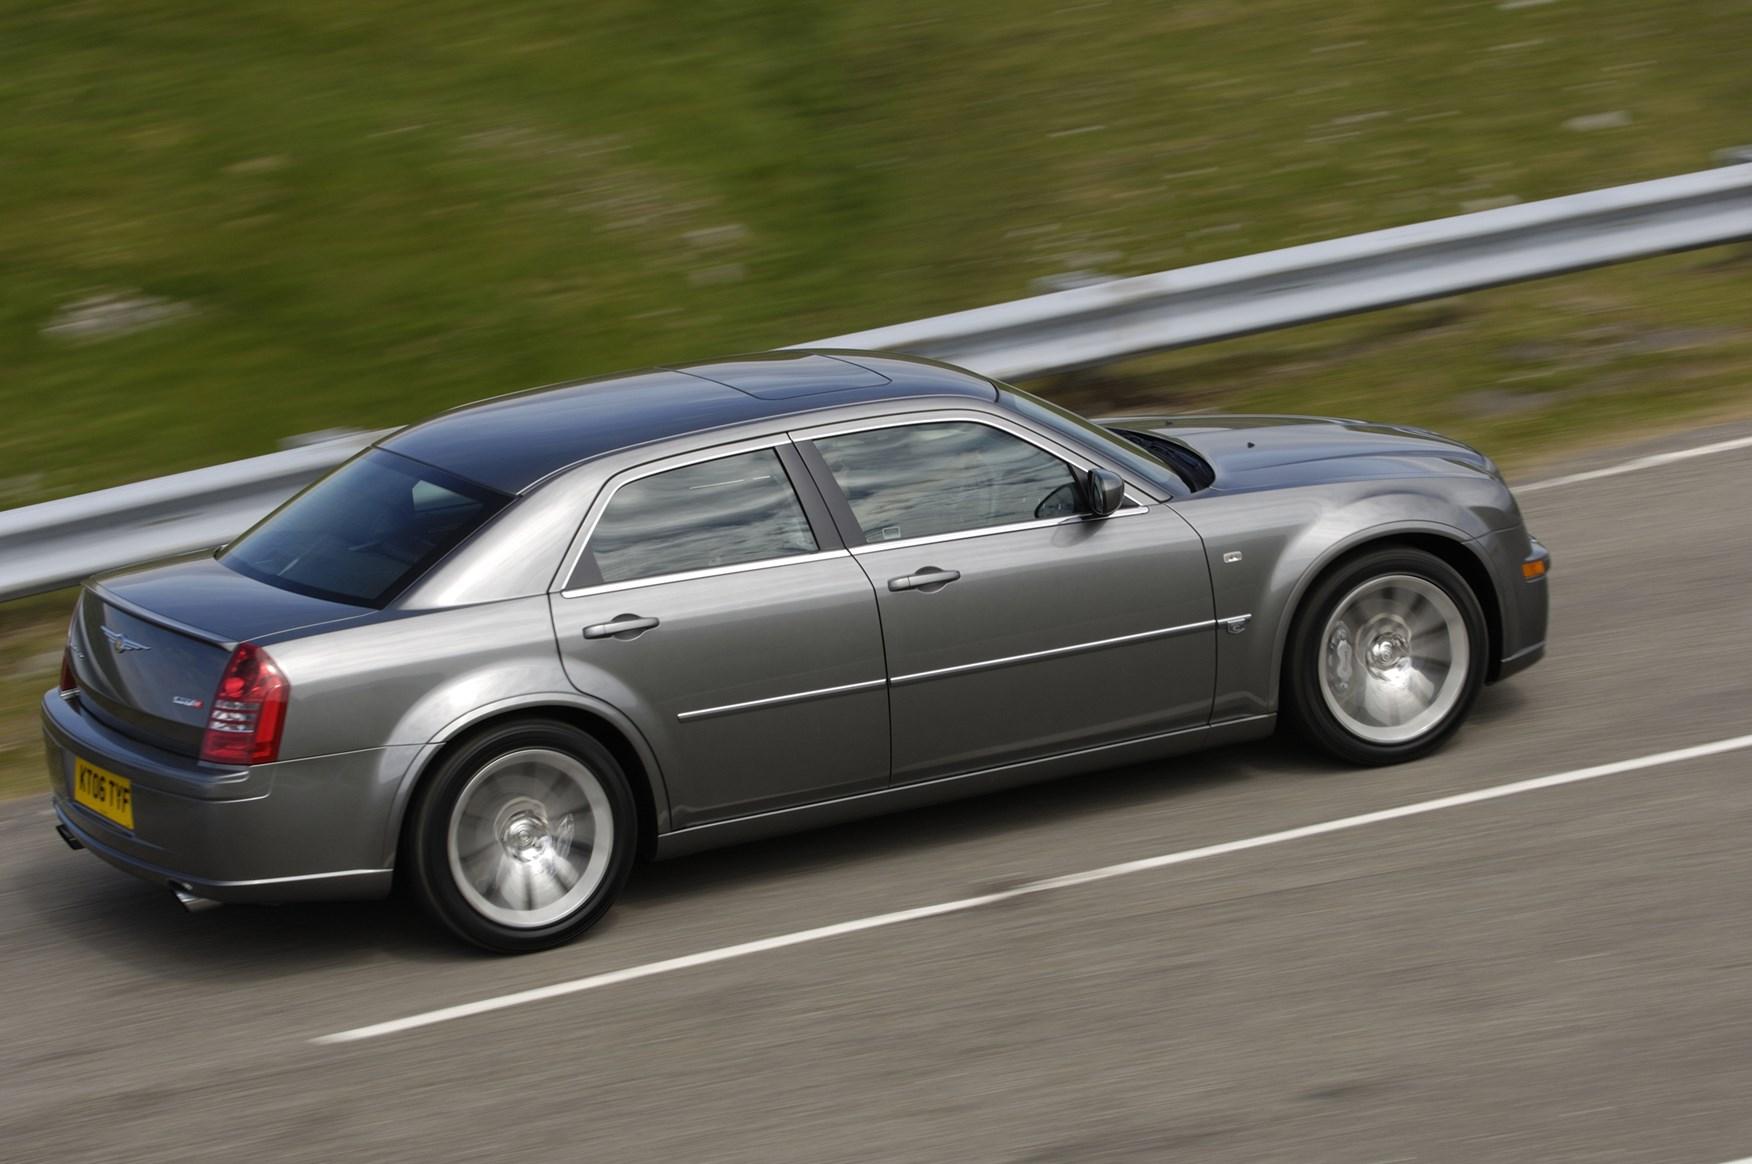 Moving Company Reviews >> Chrysler 300C SRT-8 (2006 - 2010) Photos | Parkers